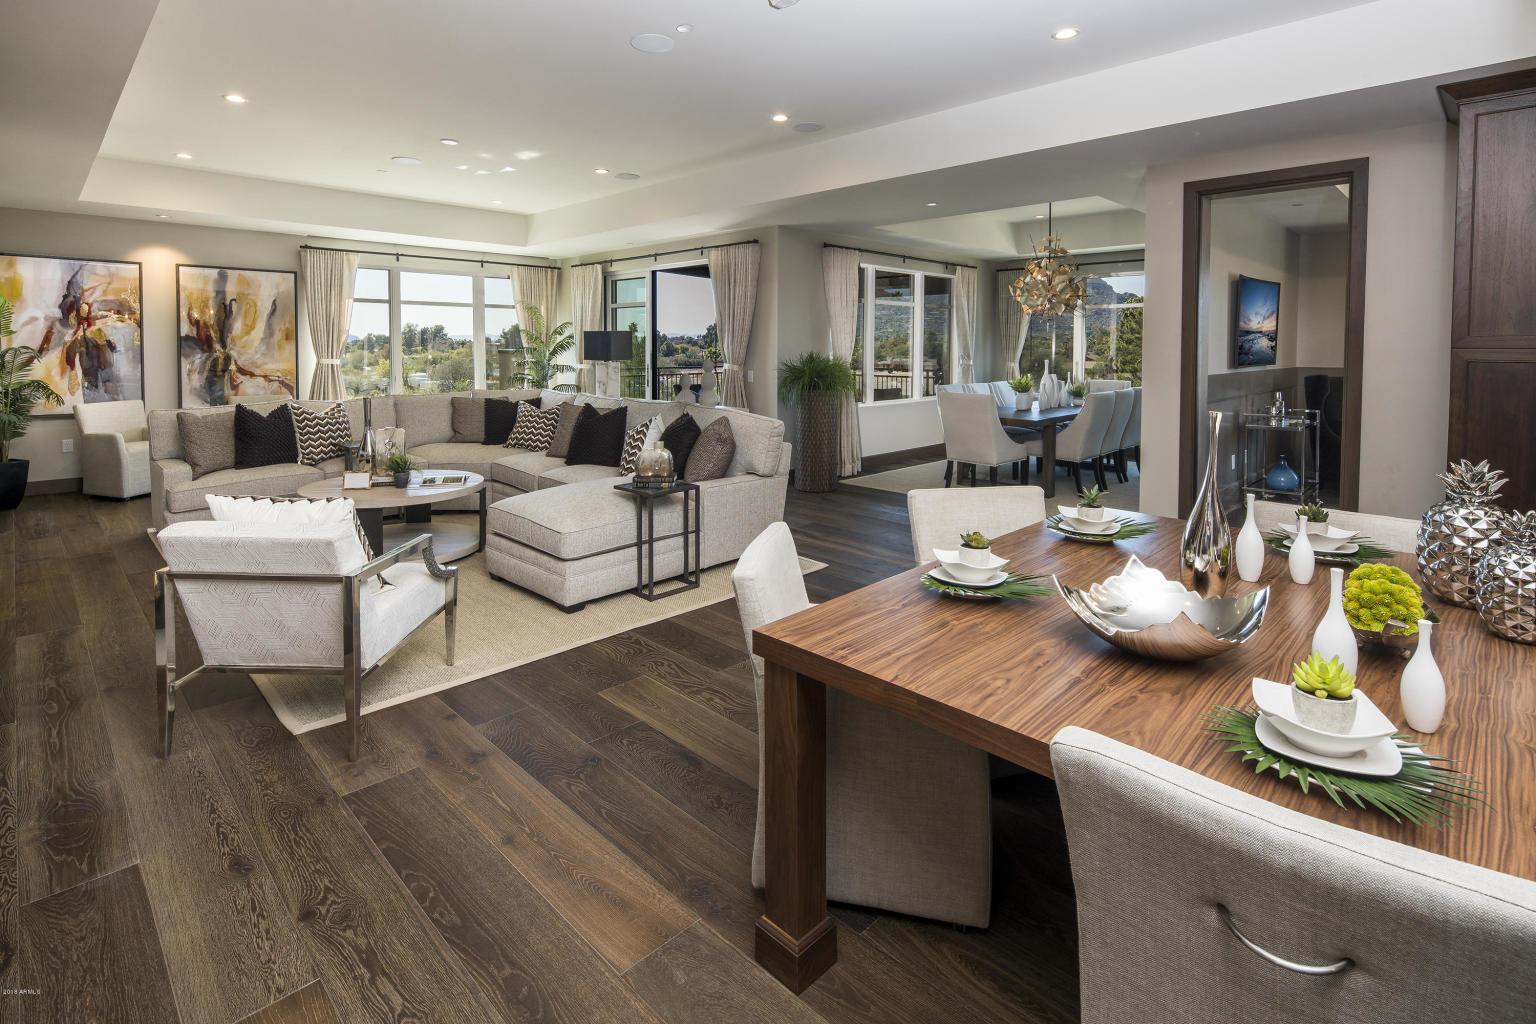 6166 N Scottsdale Rd, Paradise Valley | $2,650,000